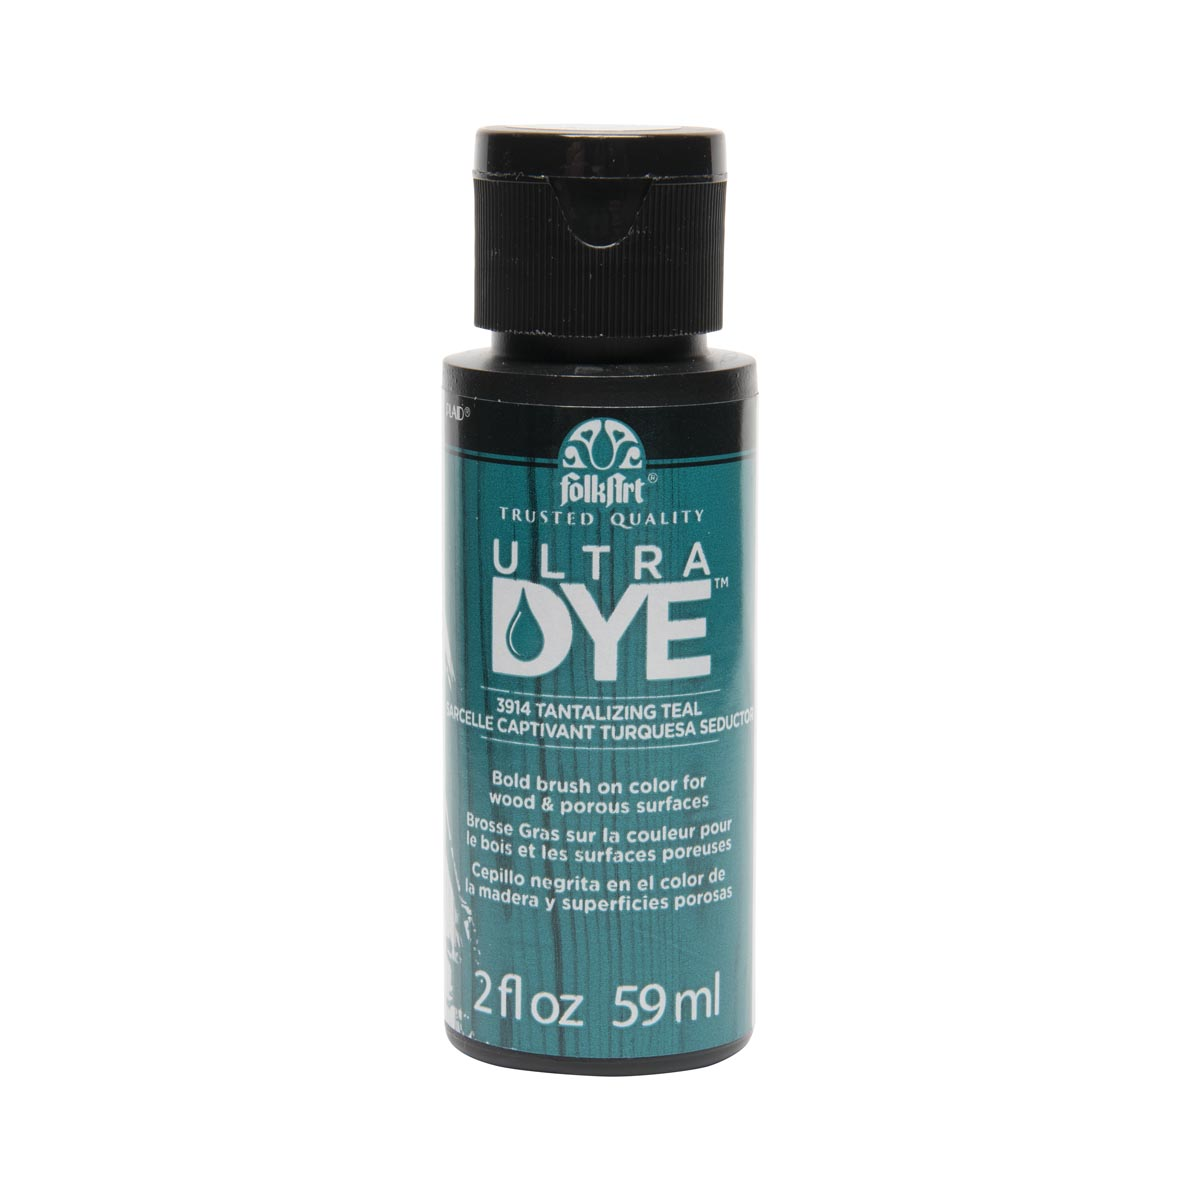 FolkArt ® Ultra Dye™ Colors - Tantalizing Teal, 2 oz. - 3914